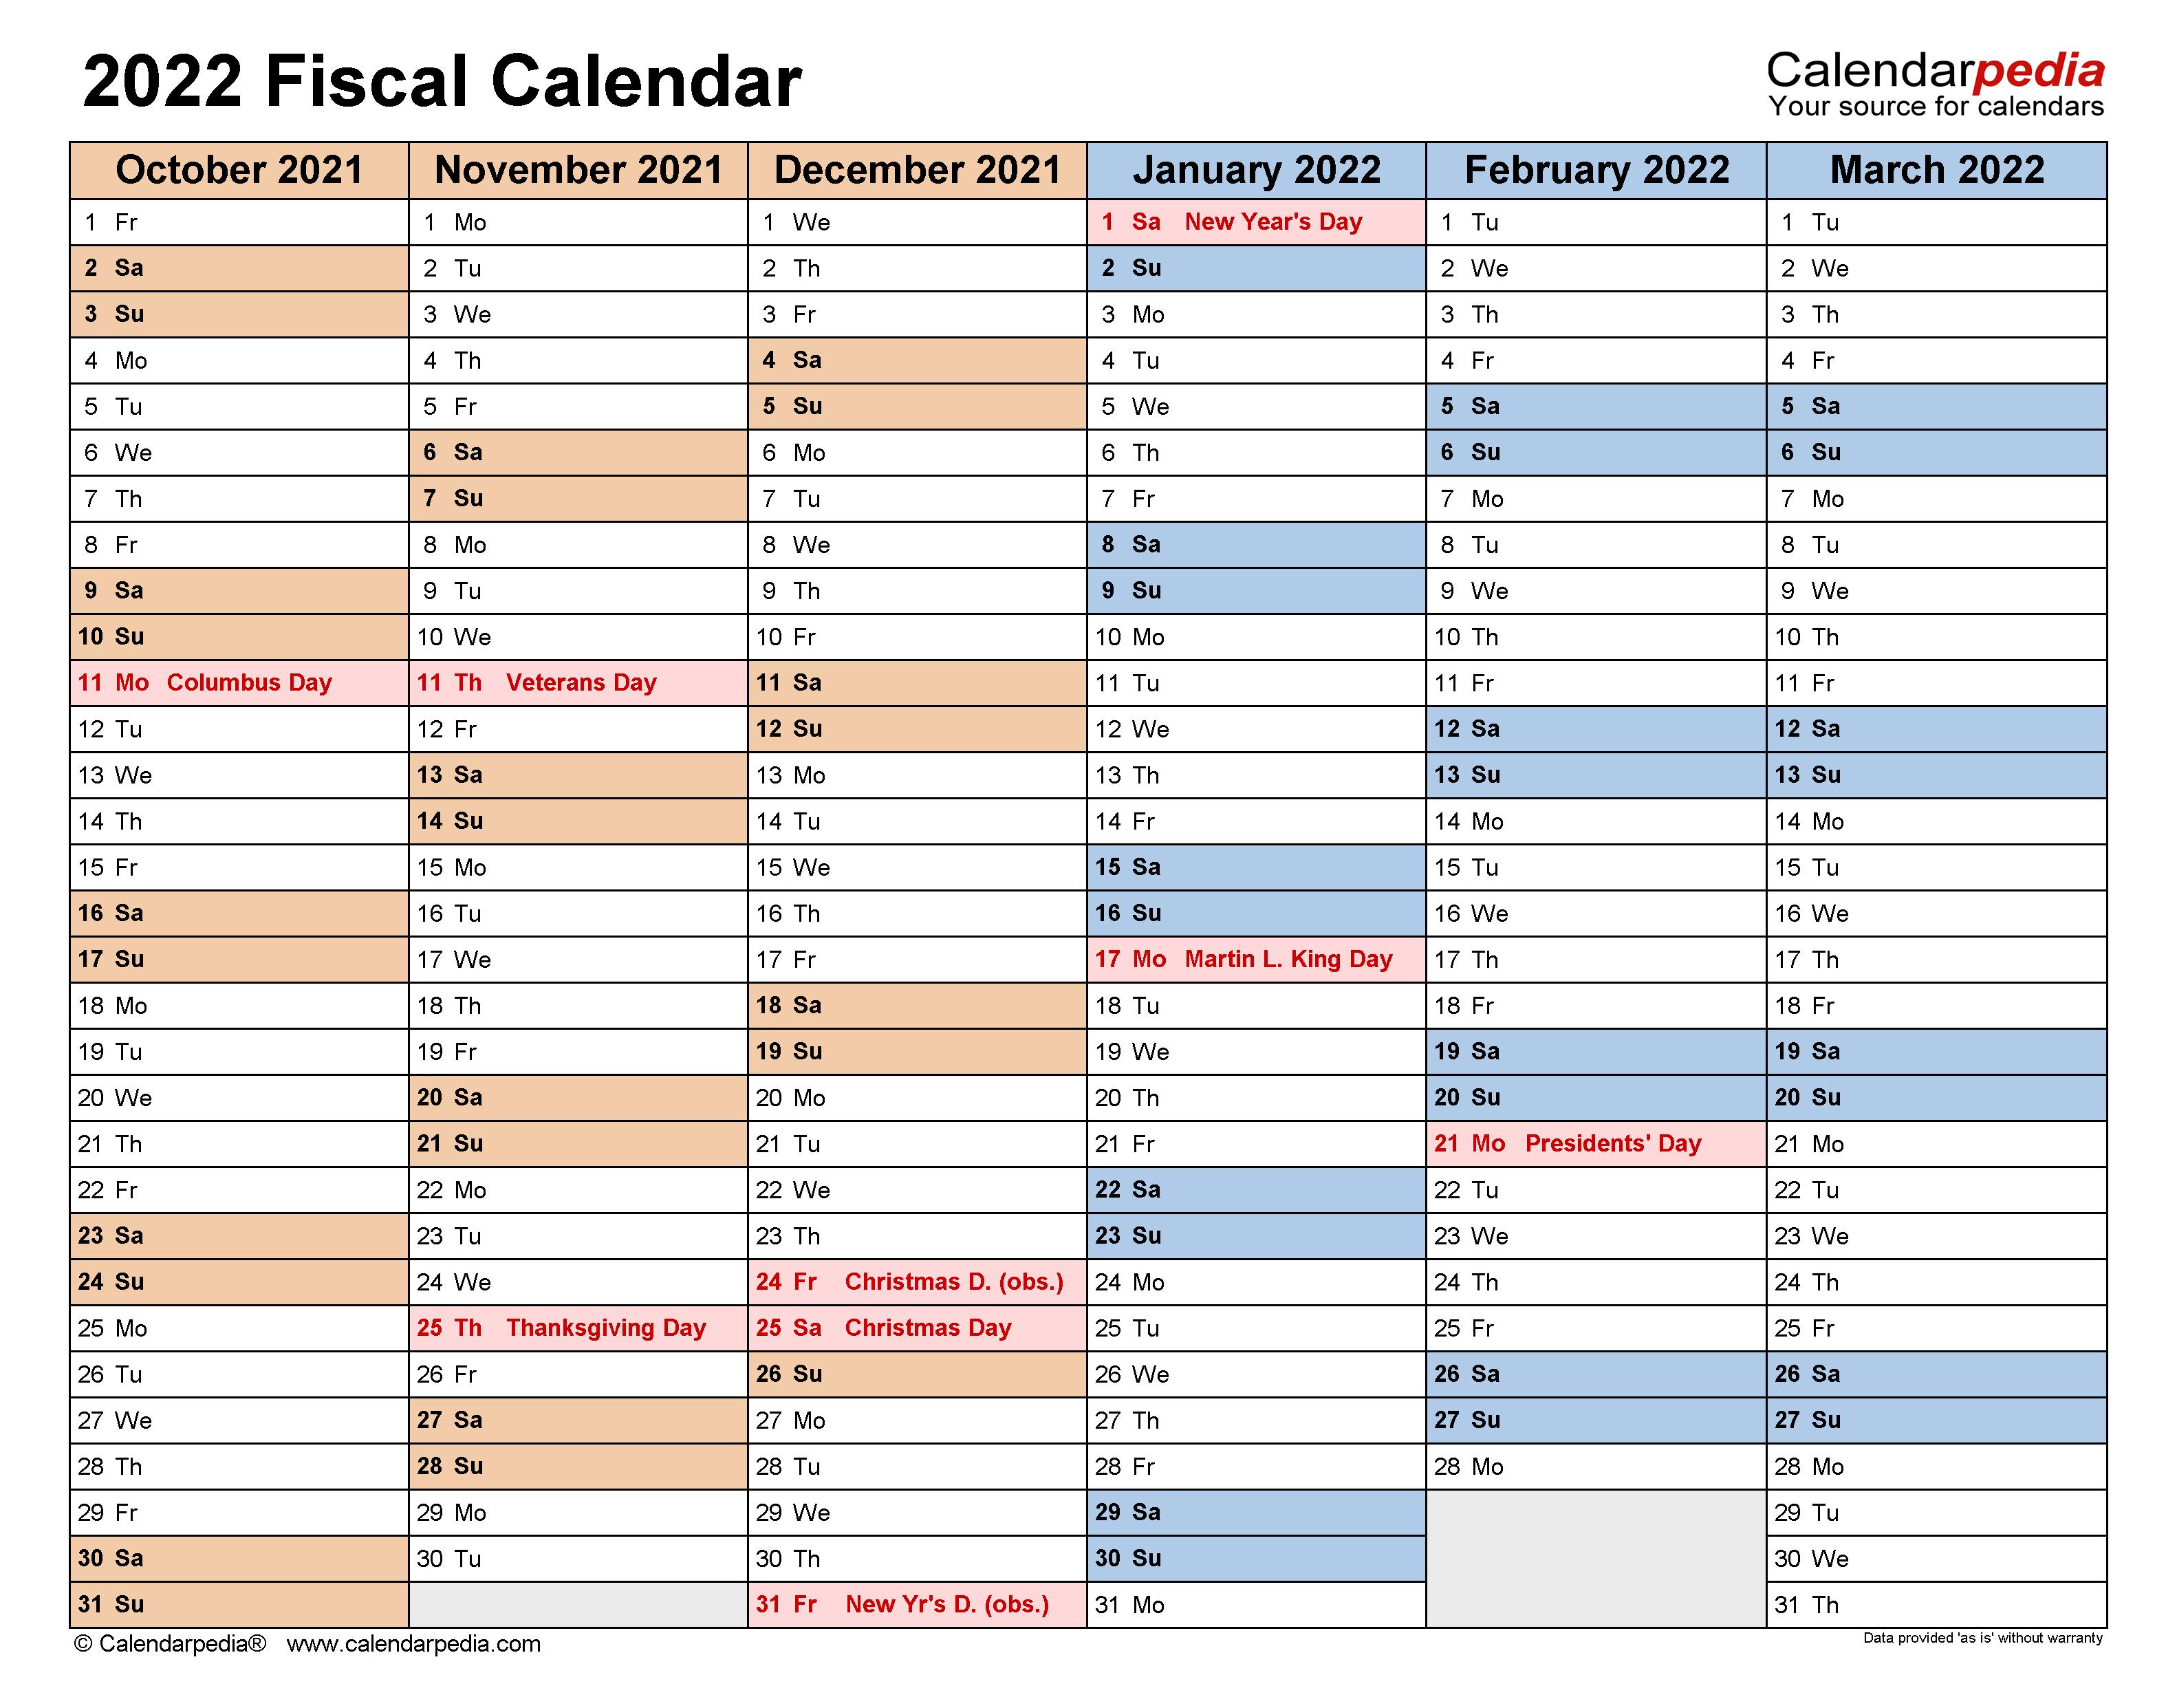 Fiscal Calendars 2022 - free printable PDF templates